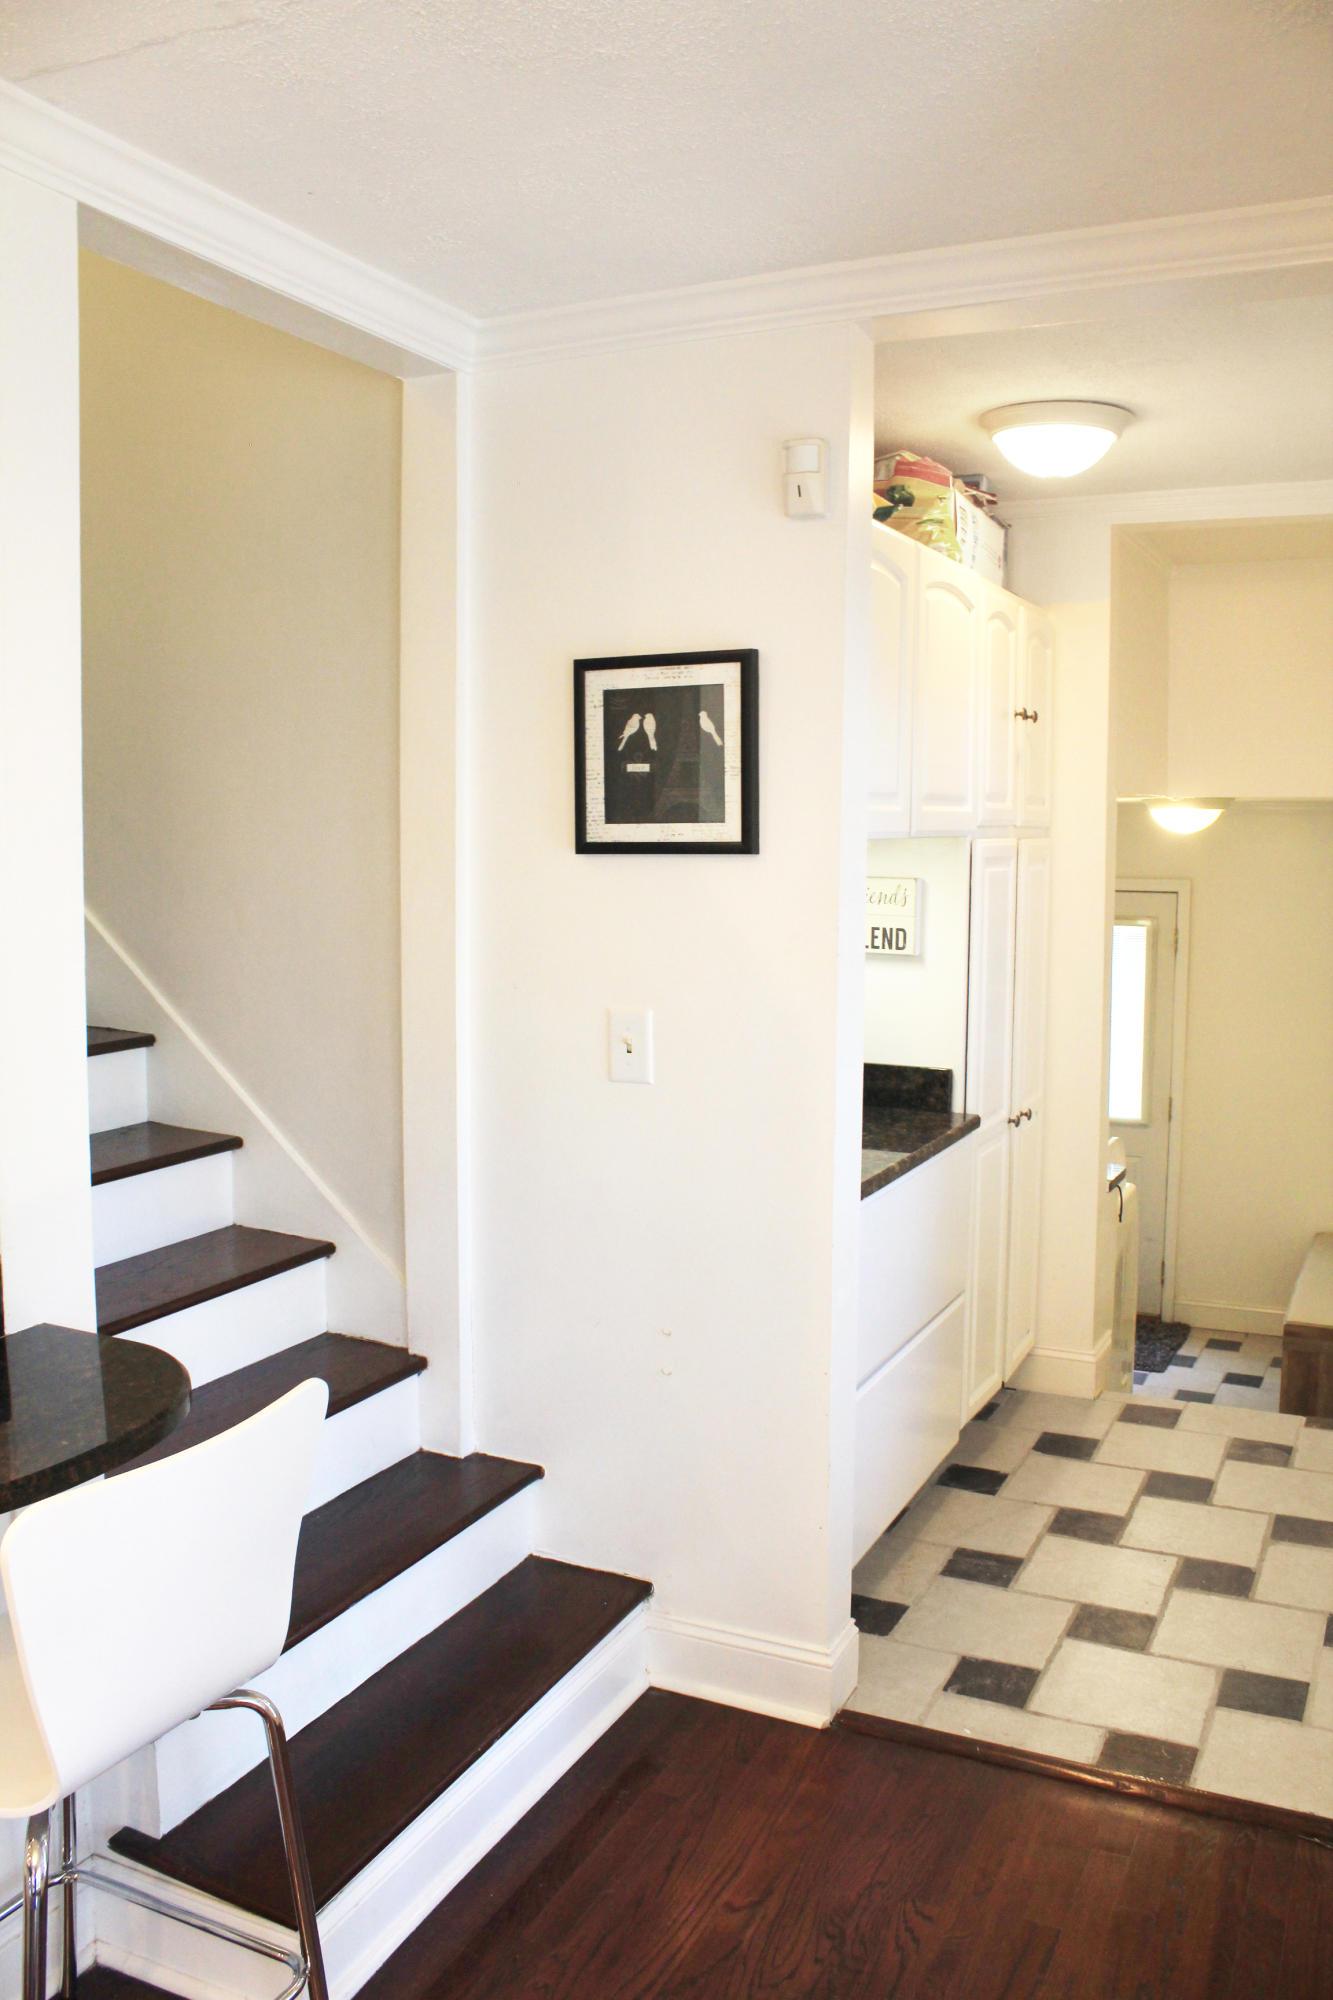 Northwoods Estates Homes For Sale - 8128 Sardis, North Charleston, SC - 29